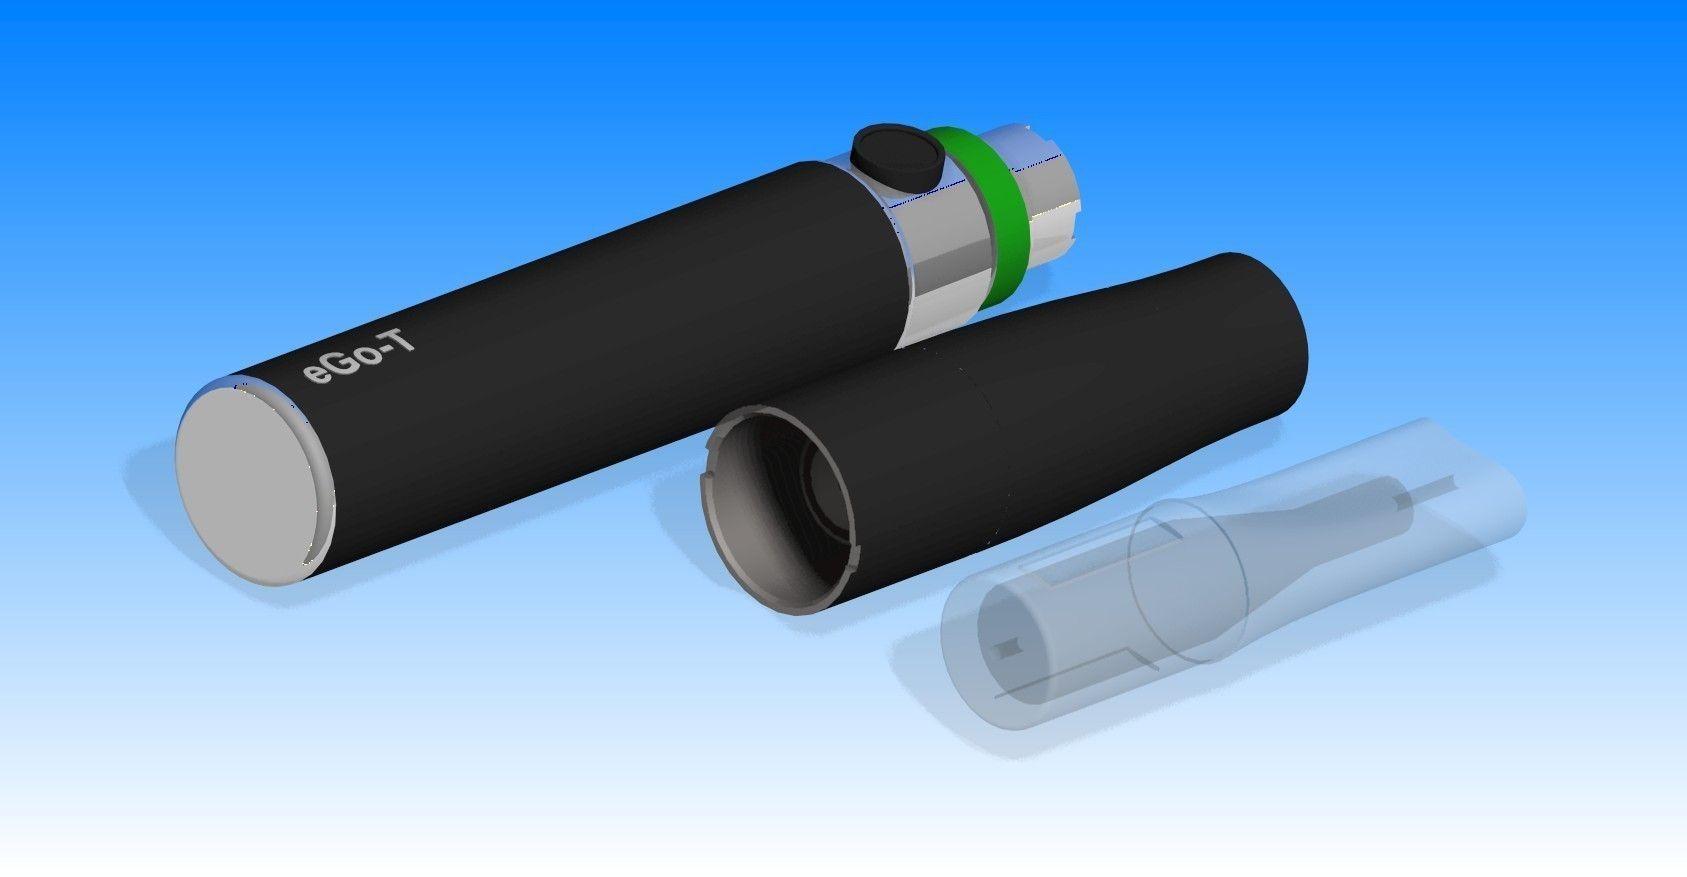 E-cigarette free 3D Model | CGTrader.com